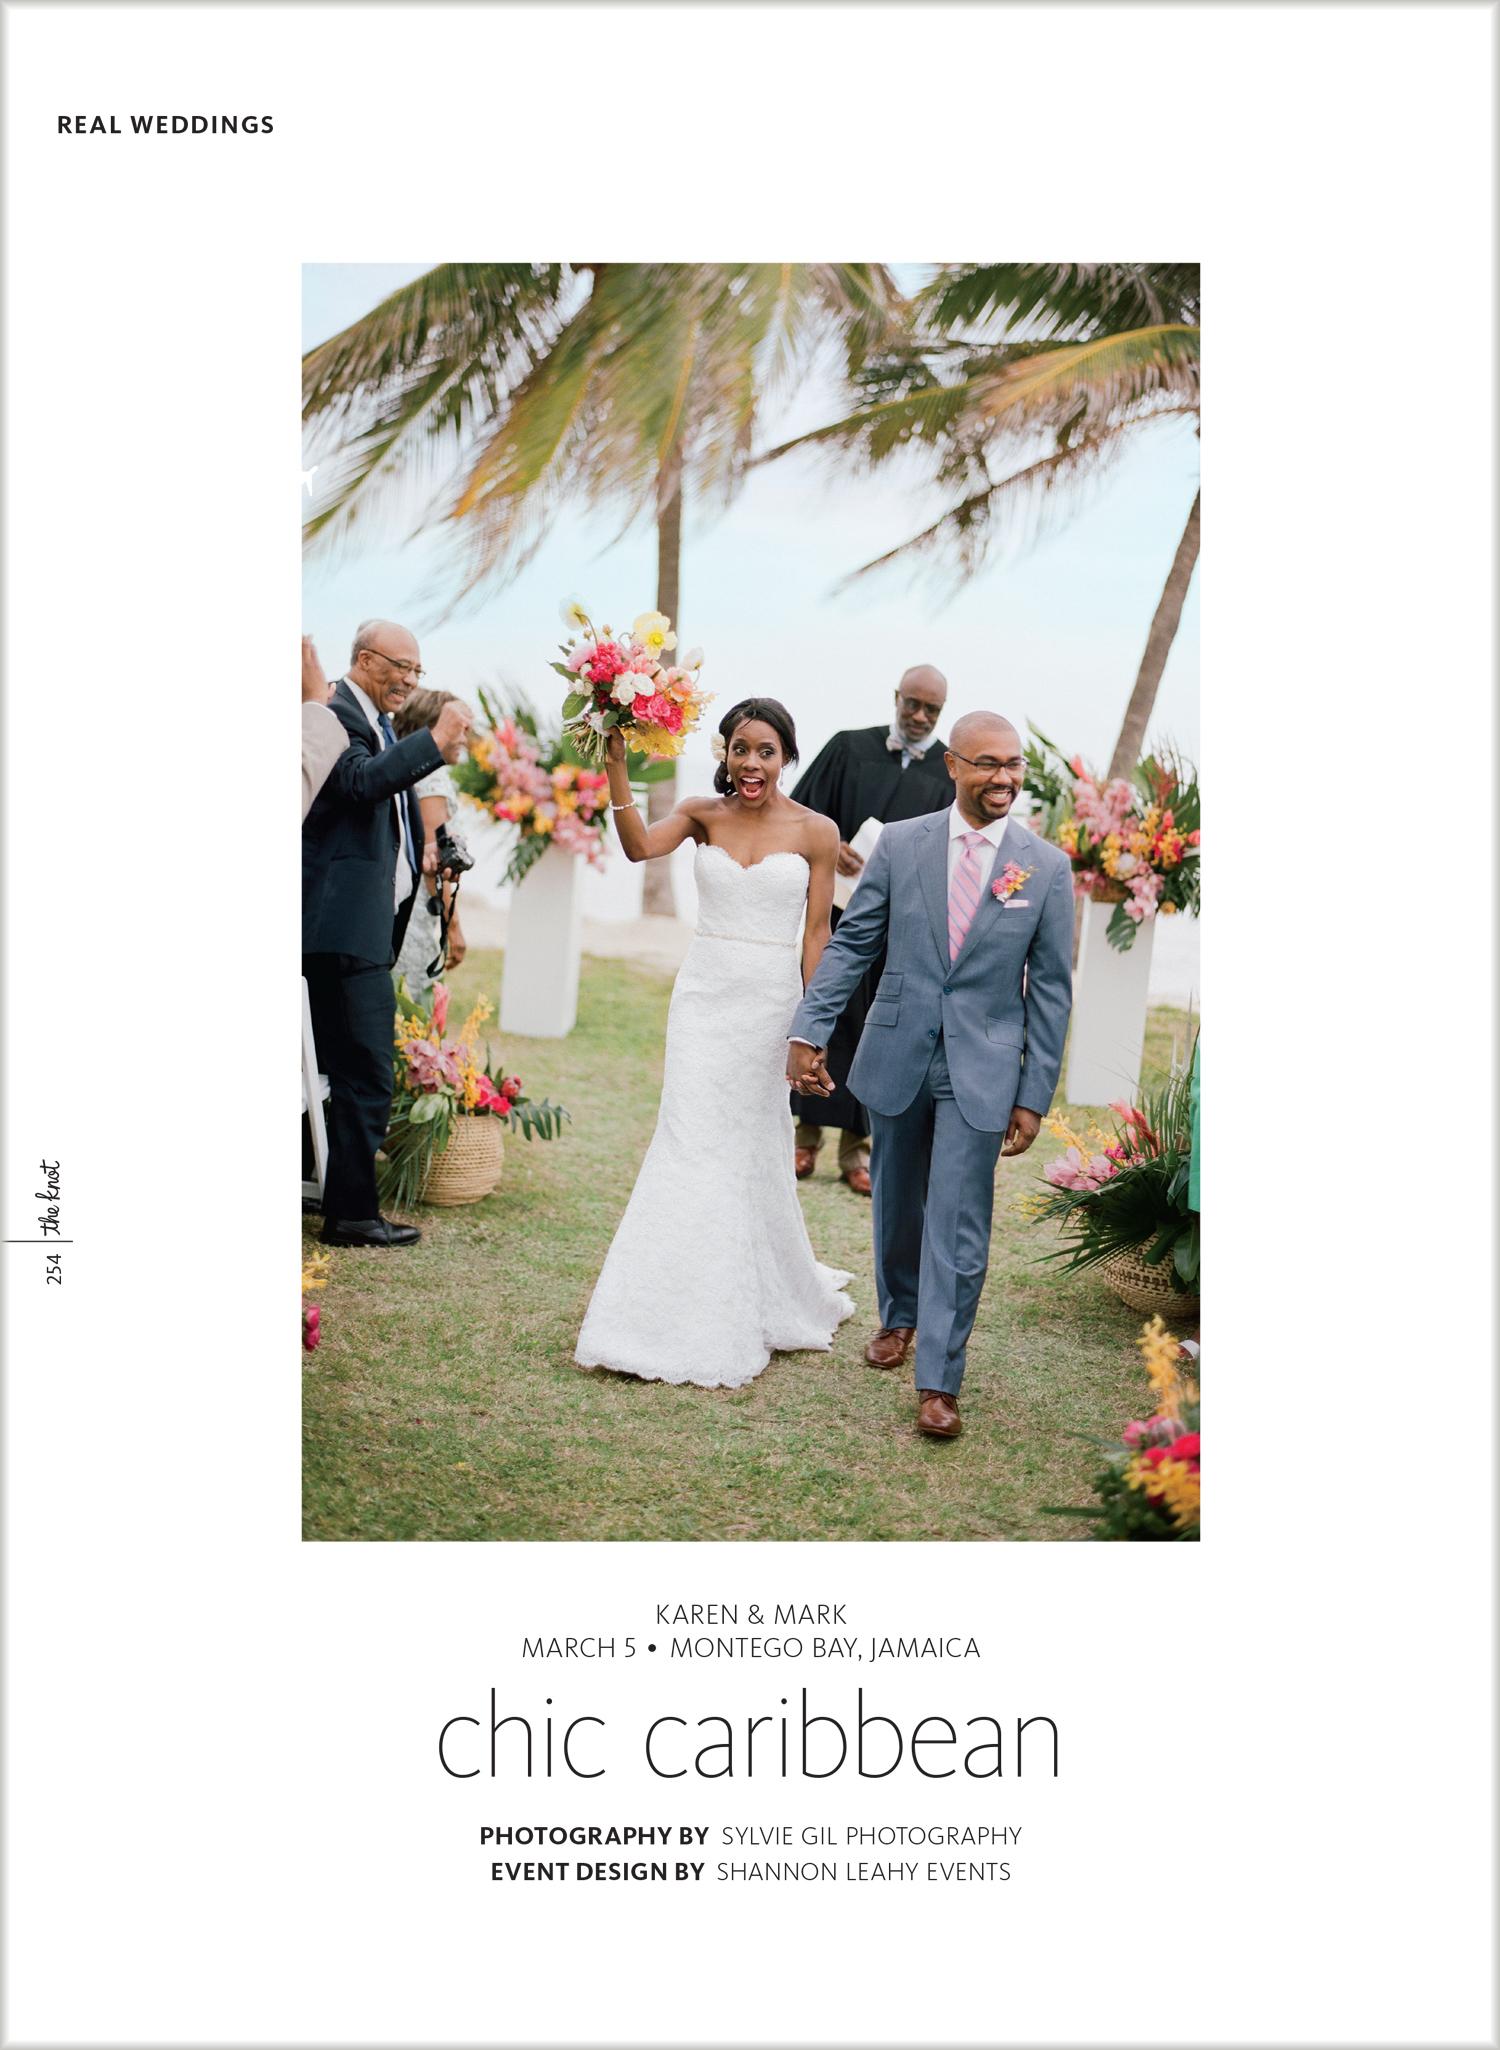 Sylvie-Gil-film-destination-wedding-photography-The-Knot-Karen-Mark-3